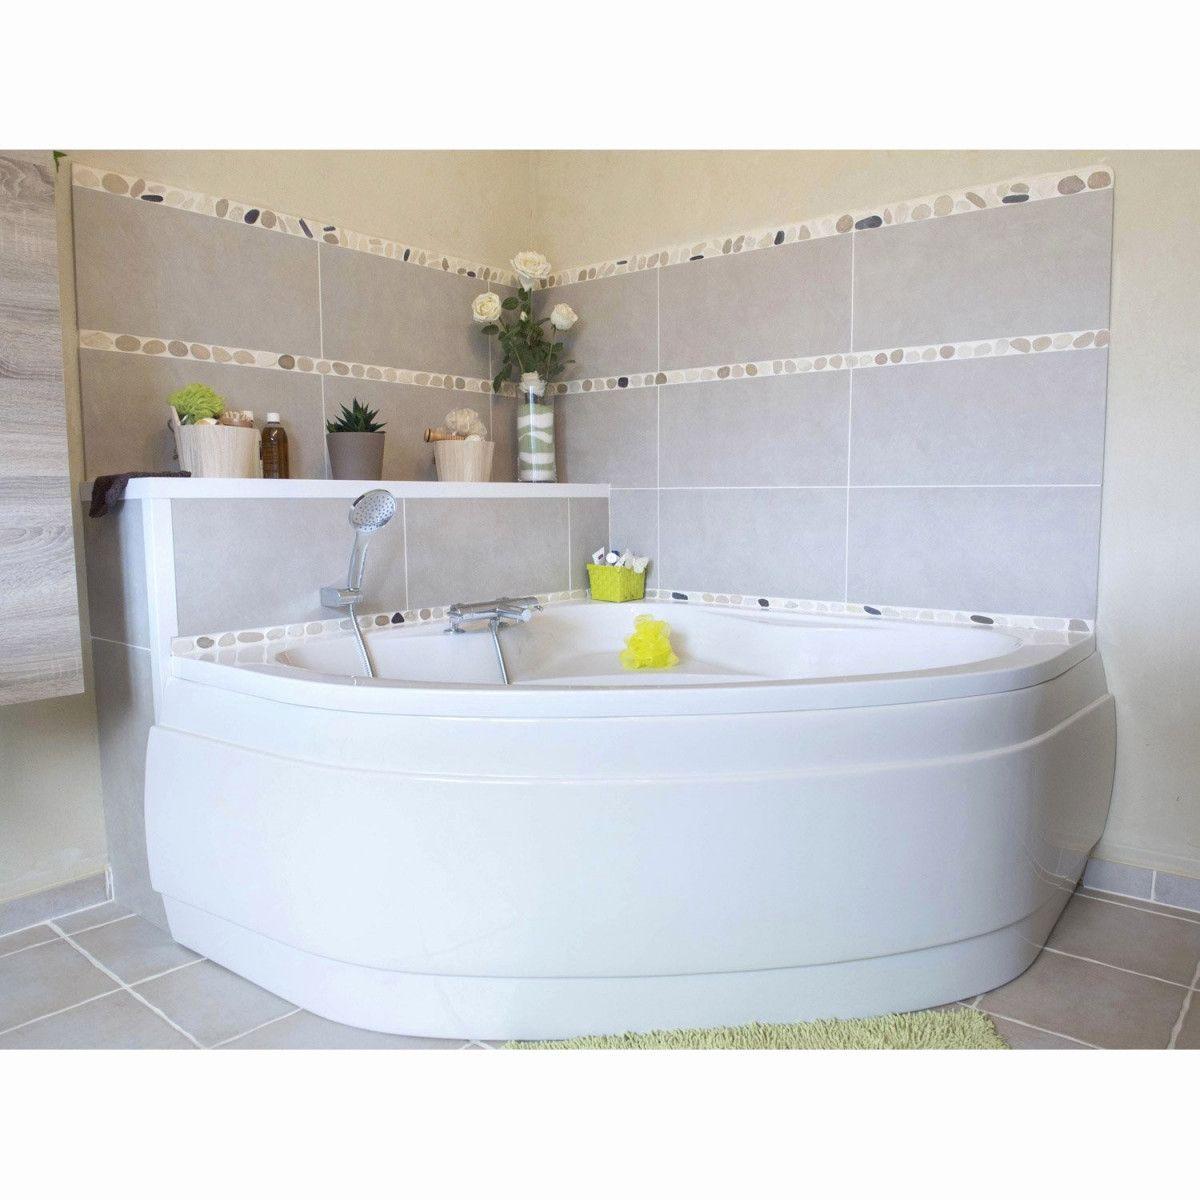 Prix Pose Baignoire Leroy Merlin Cela Va Egayer Votre Matin Bathtubs For Sale Bathtub Small Bathtub